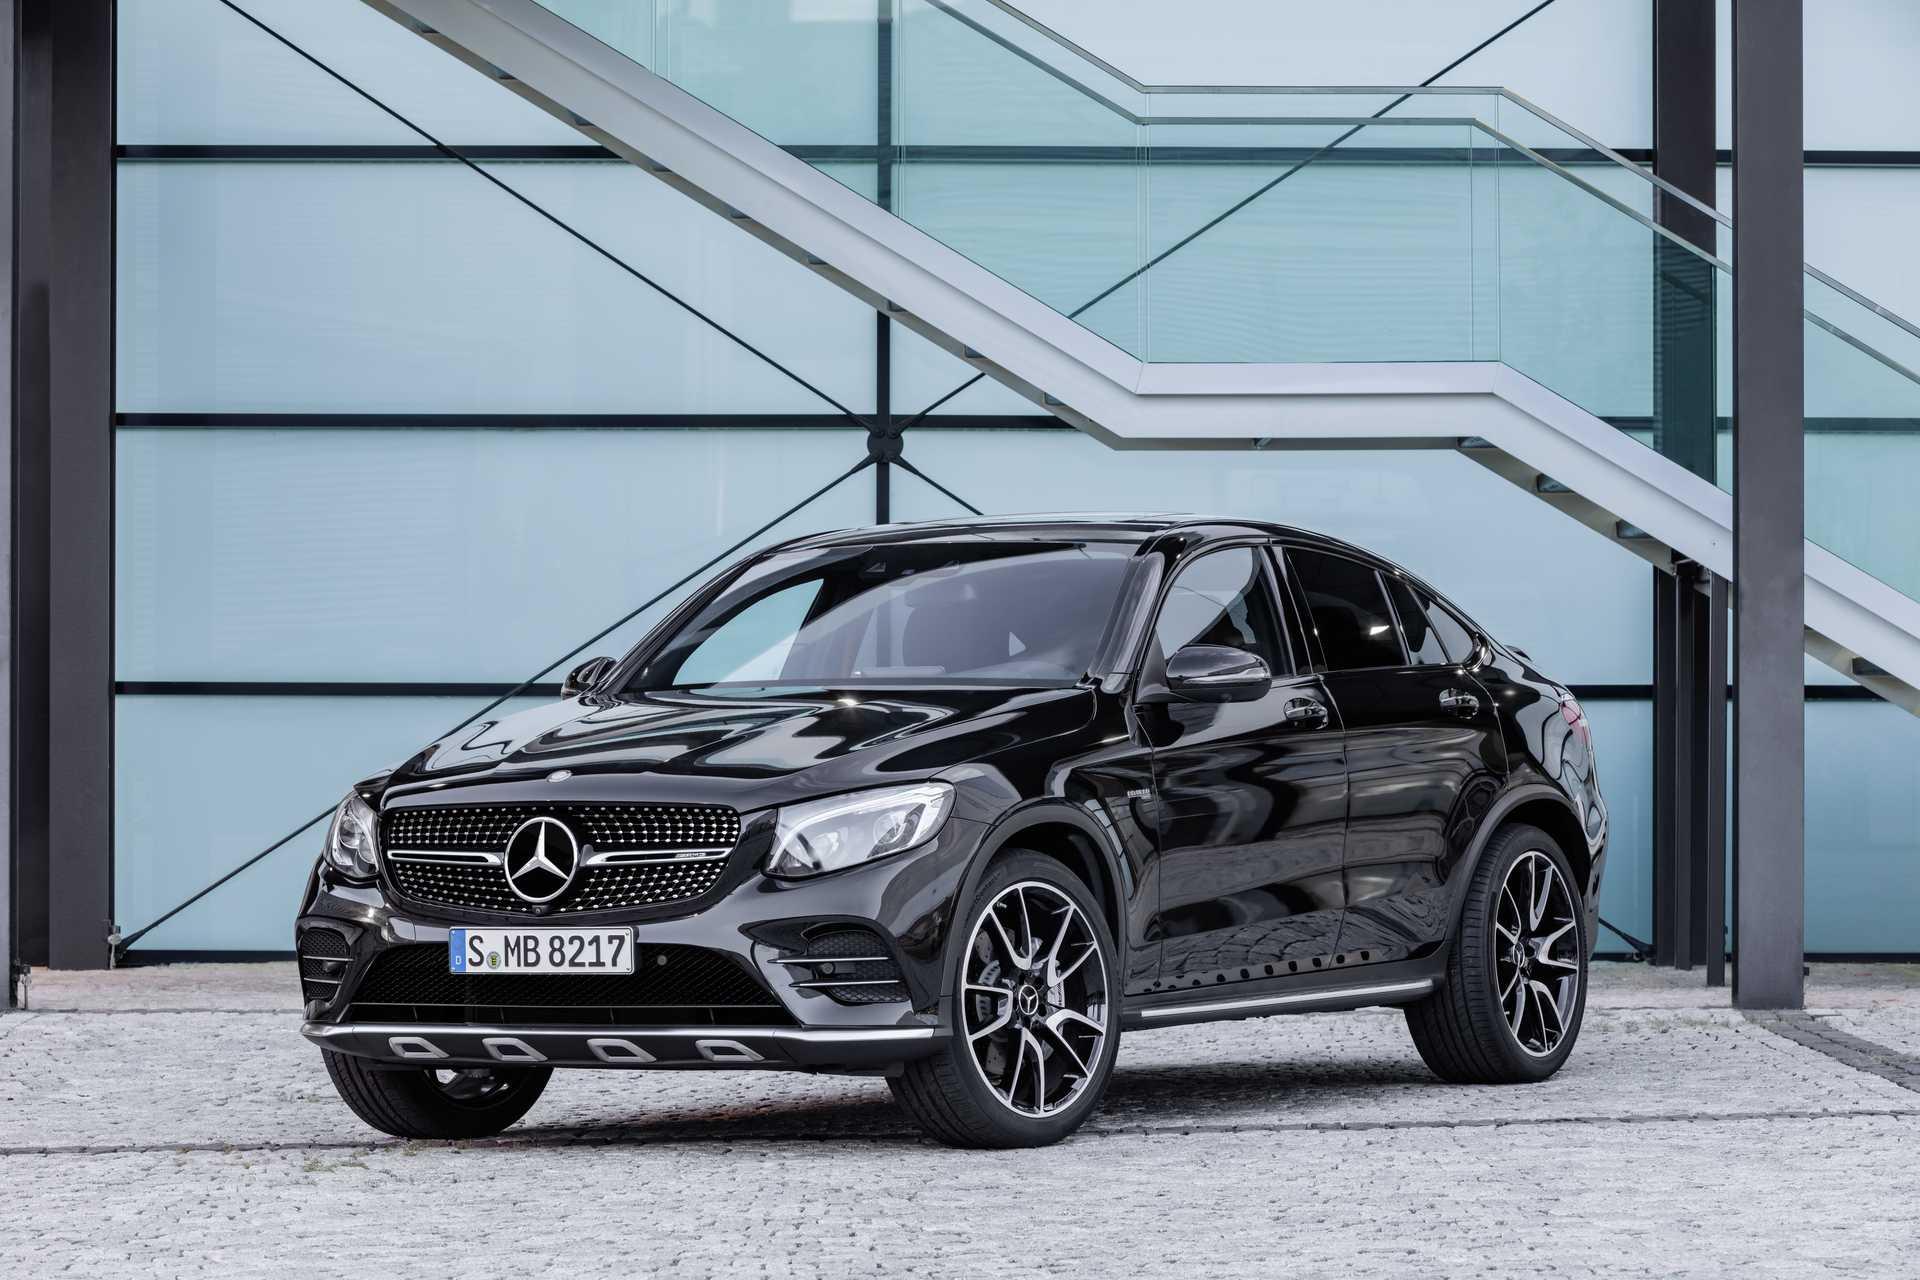 Mercedes-Benz AMG GLC 43 Coupé 4MATIC 9G-Tronic, 367hp, 2017